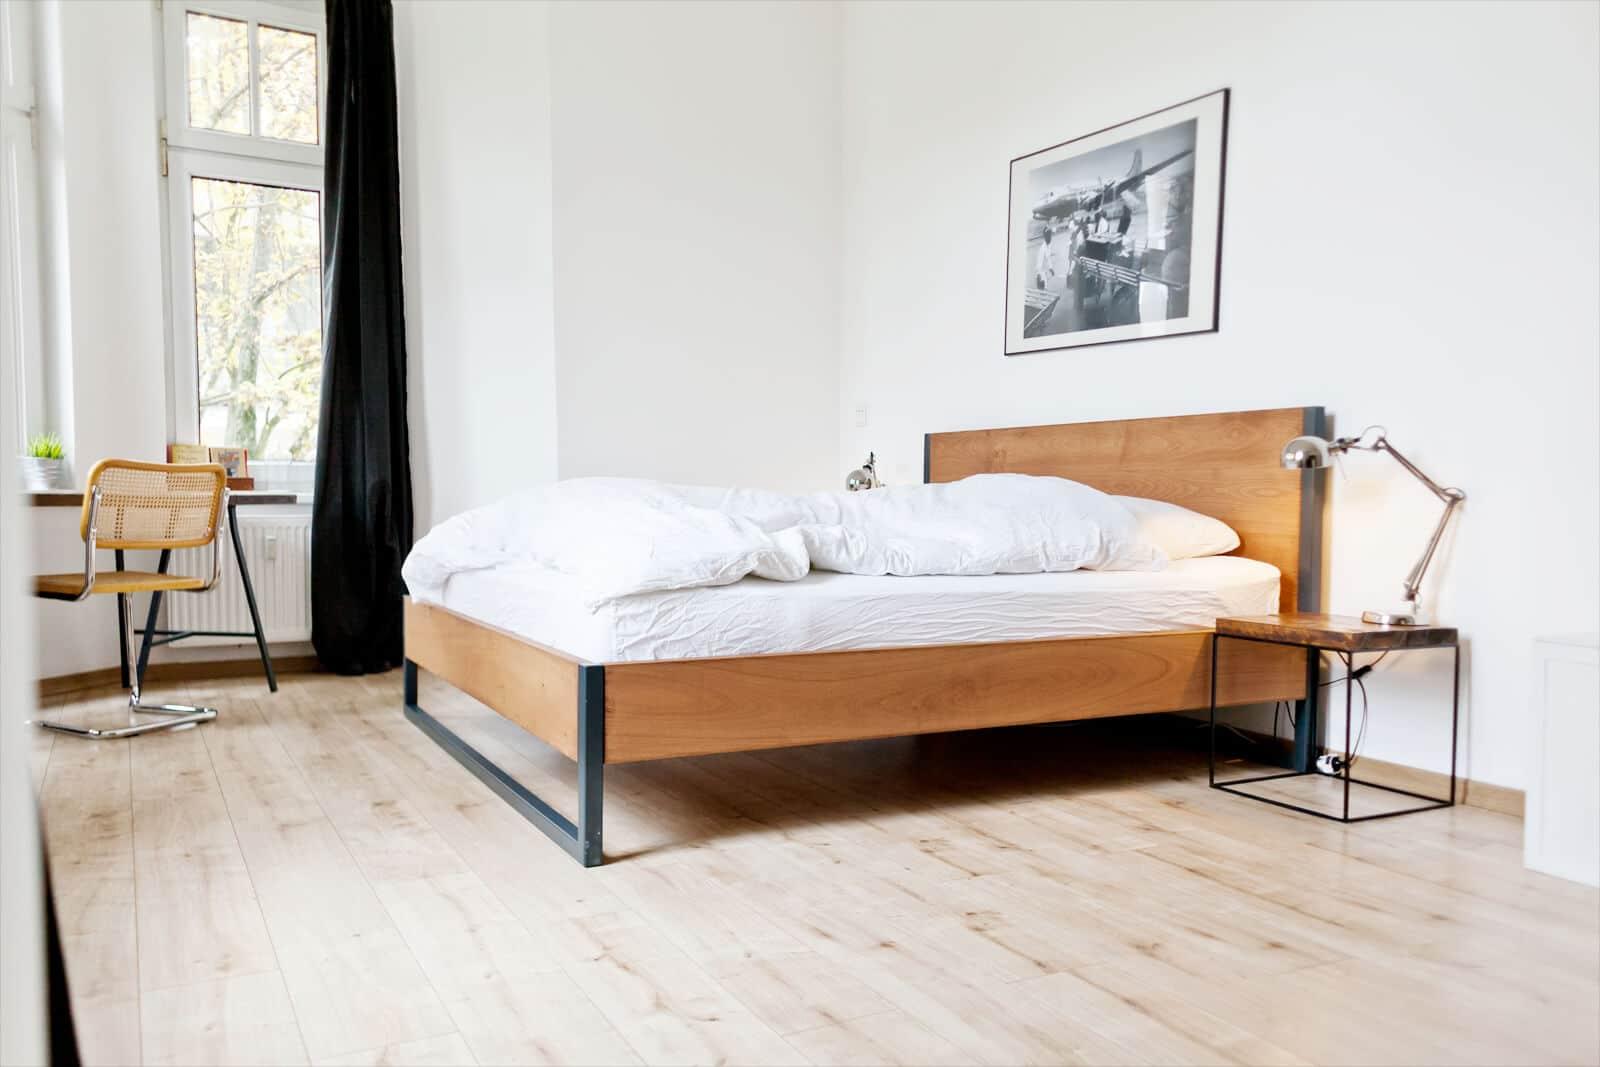 Full Size of Bett Vintage Loft 110 N51e12 Design Manufacture Romantisches Boxspring Dänisches Bettenlager Badezimmer Ausziehbar Stauraum Ebay Betten 180x200 140x220 Flexa Bett Bett Vintage